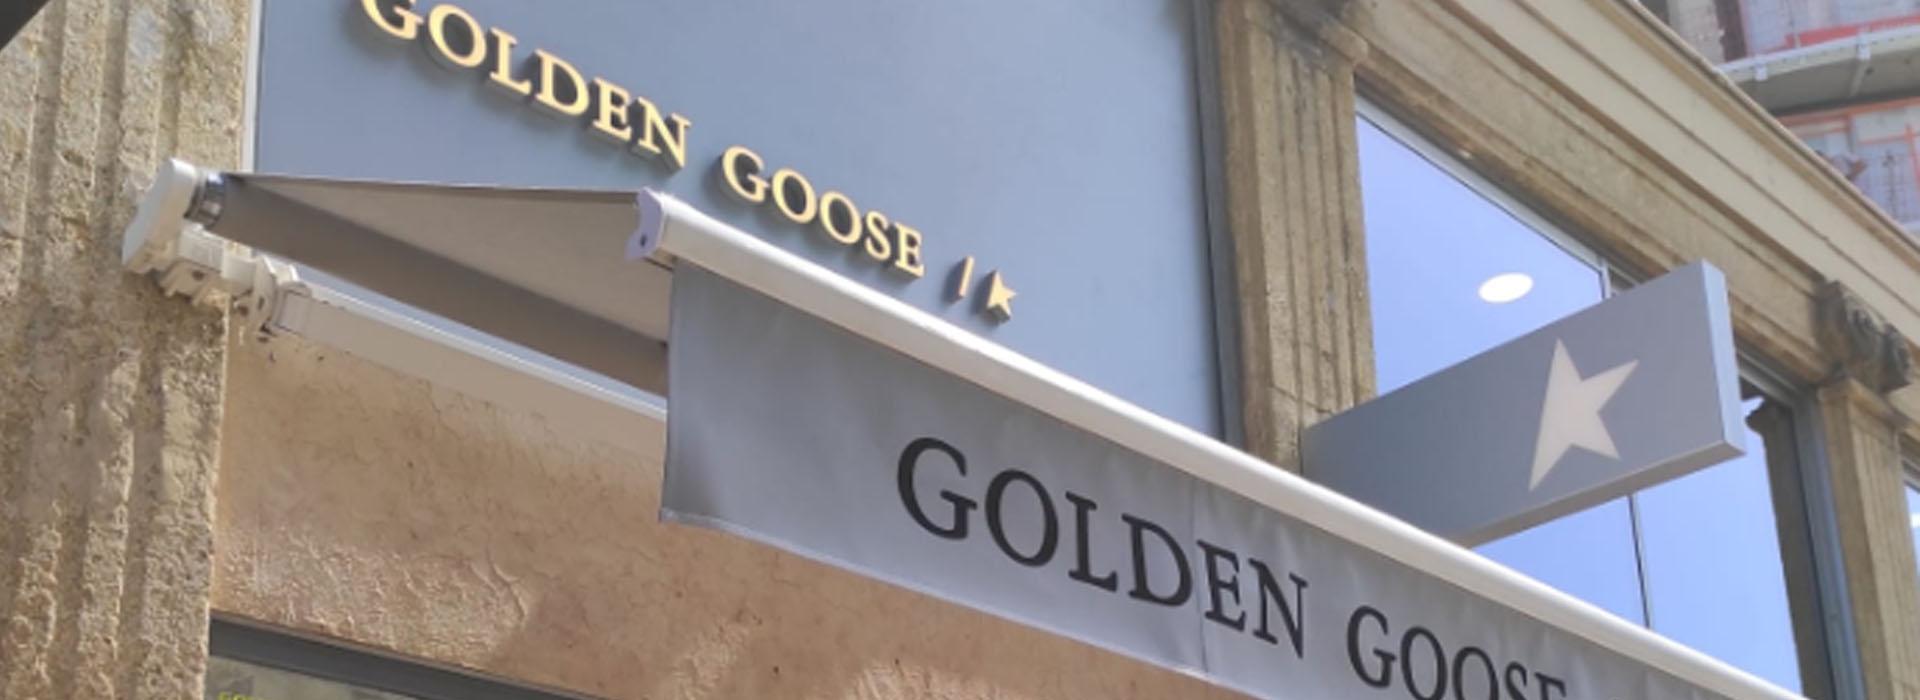 GOLDEN GOOSE | RETAIL